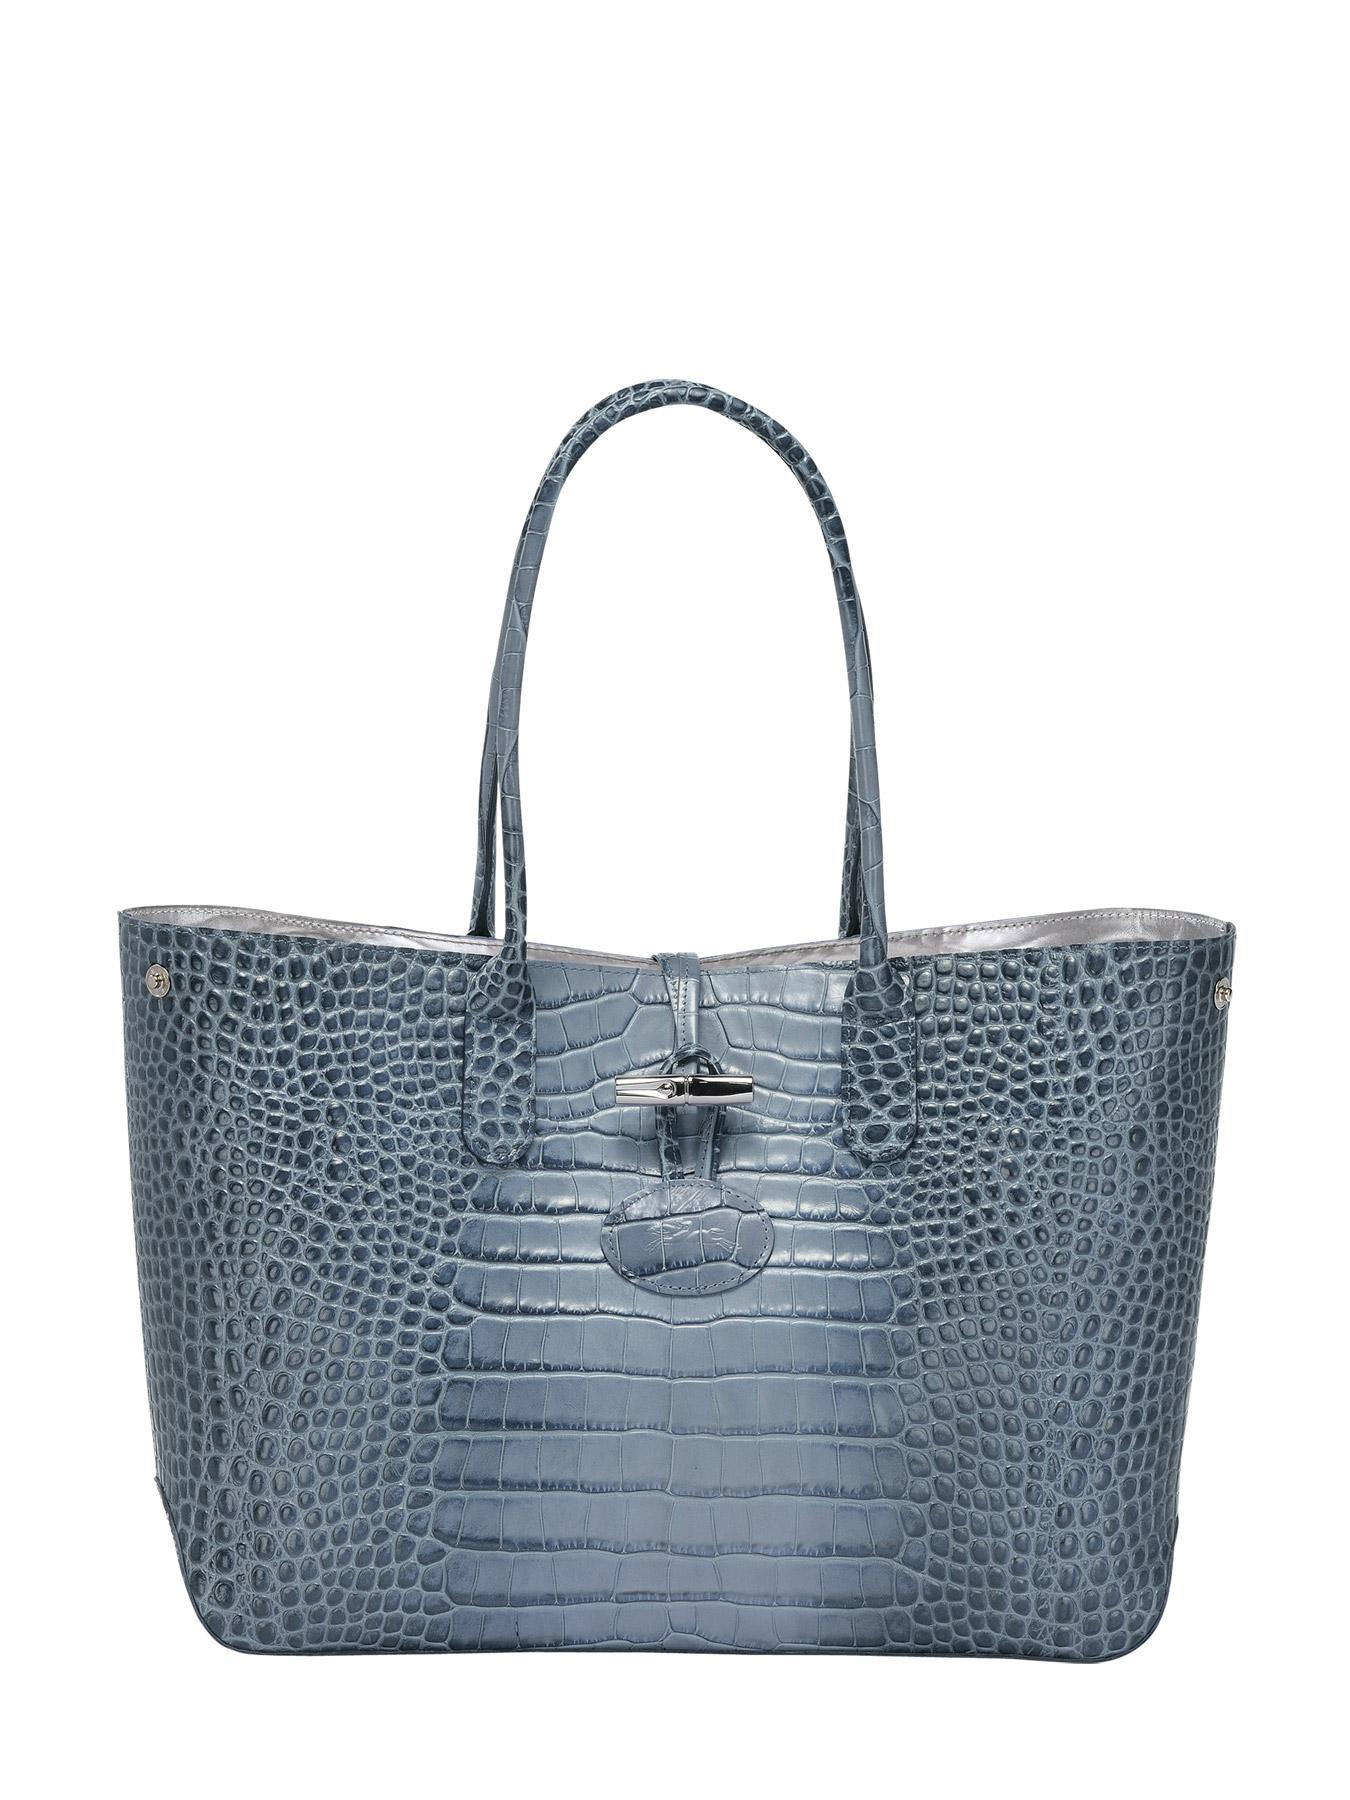 Edisac Longchamp a be Roseau 2686924 Borsa Su Croco tracolla AE4qnnw0